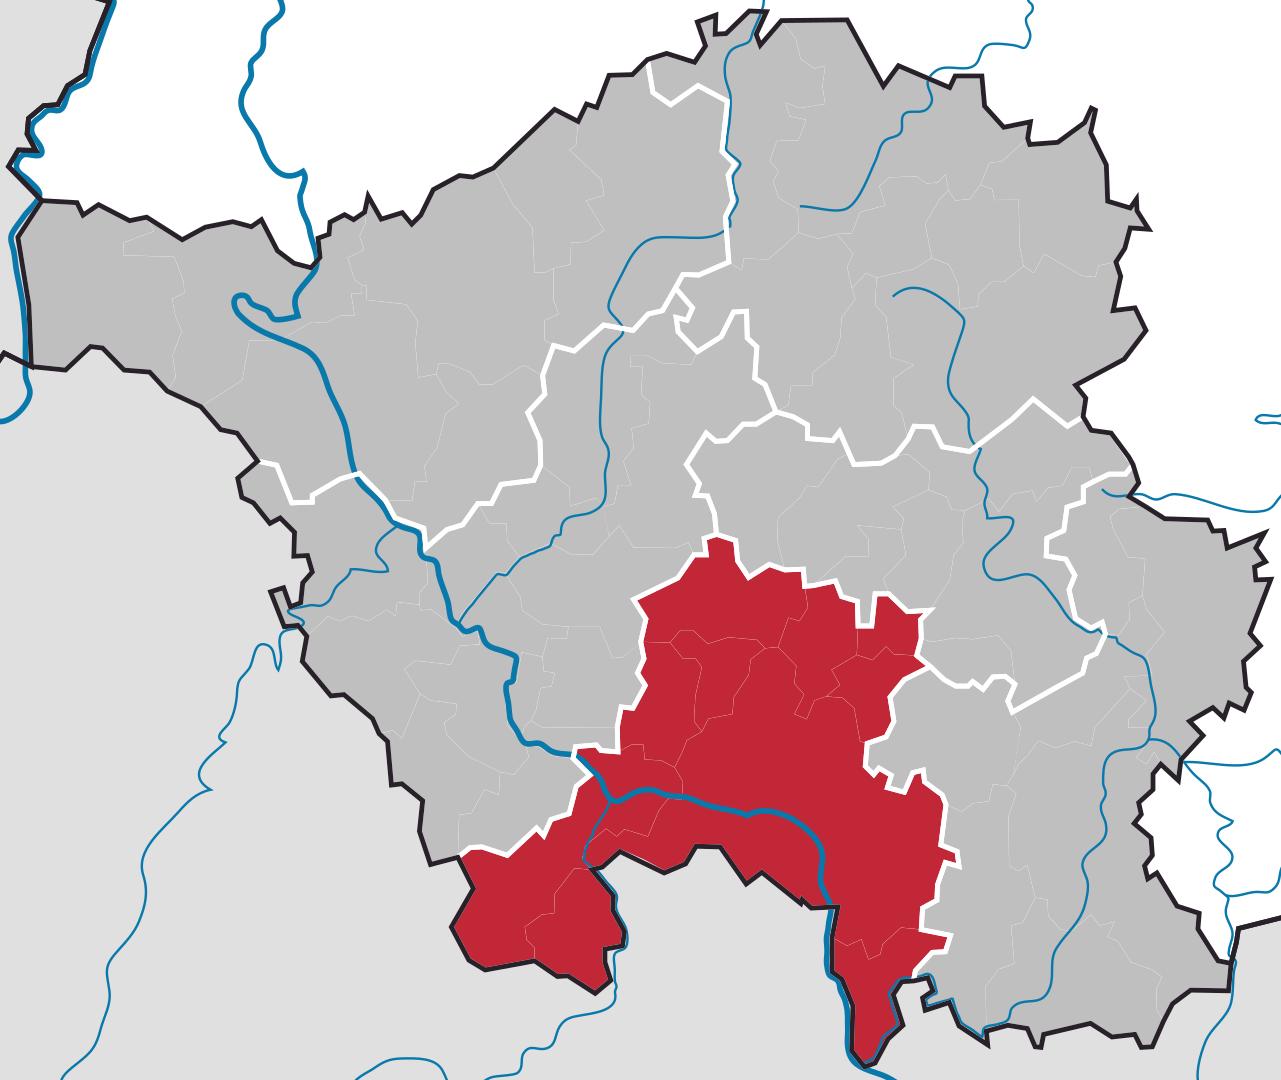 LK_Saarbrücken_Völklingen